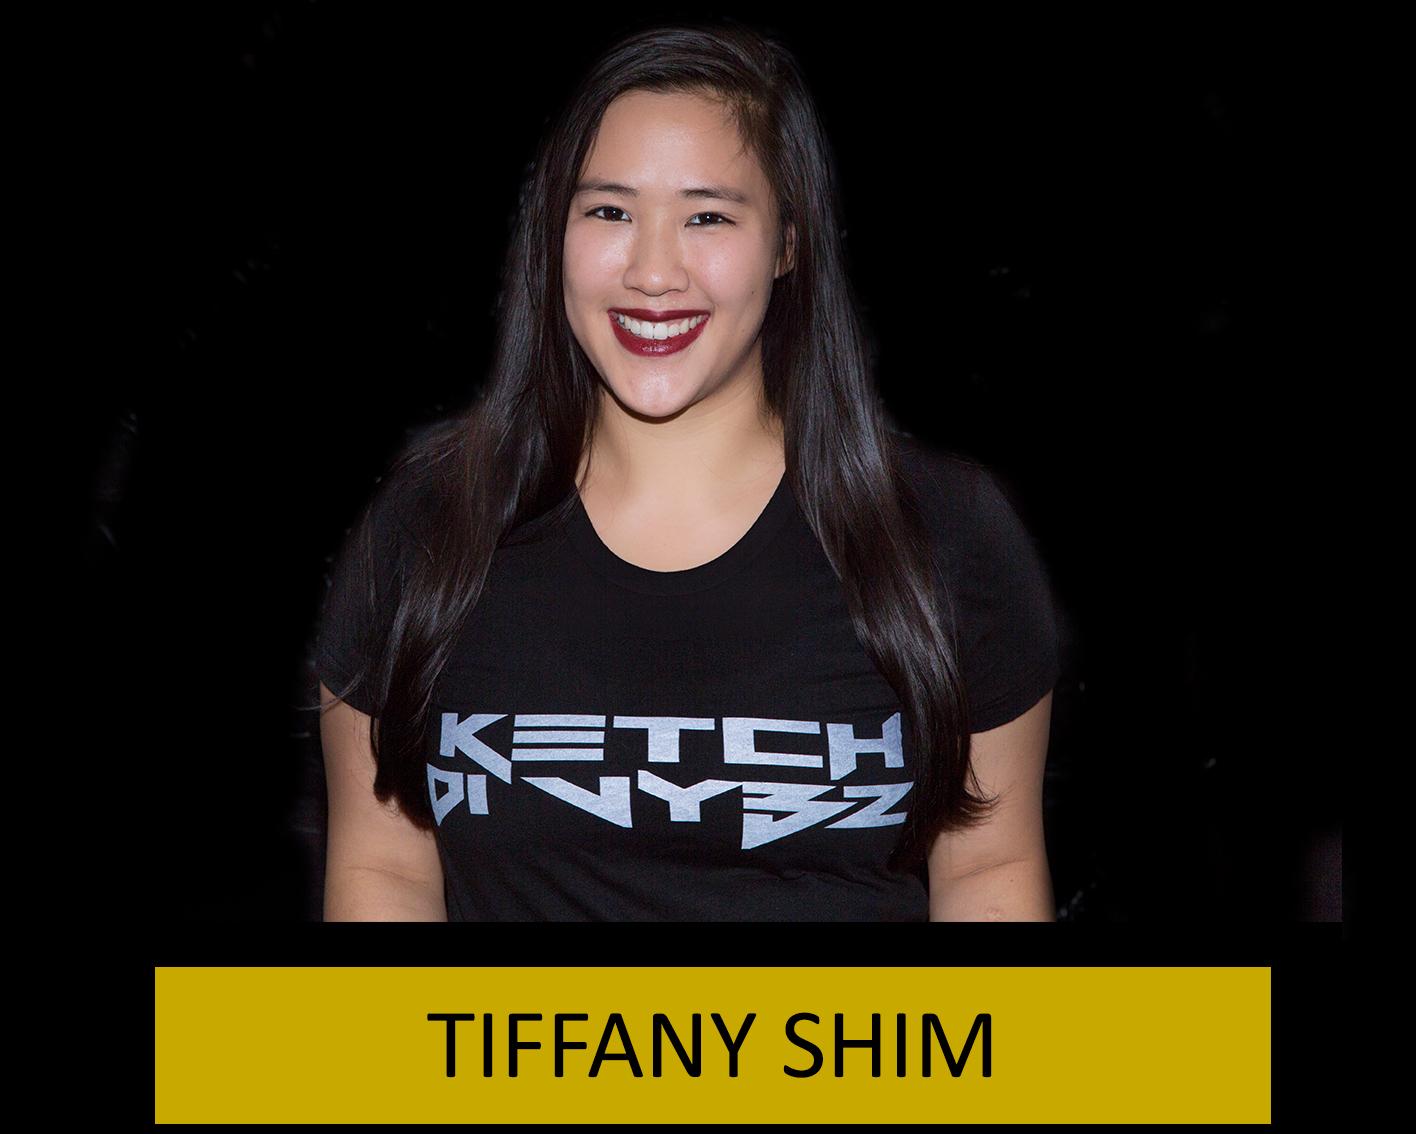 Click to read bio: Tiffany